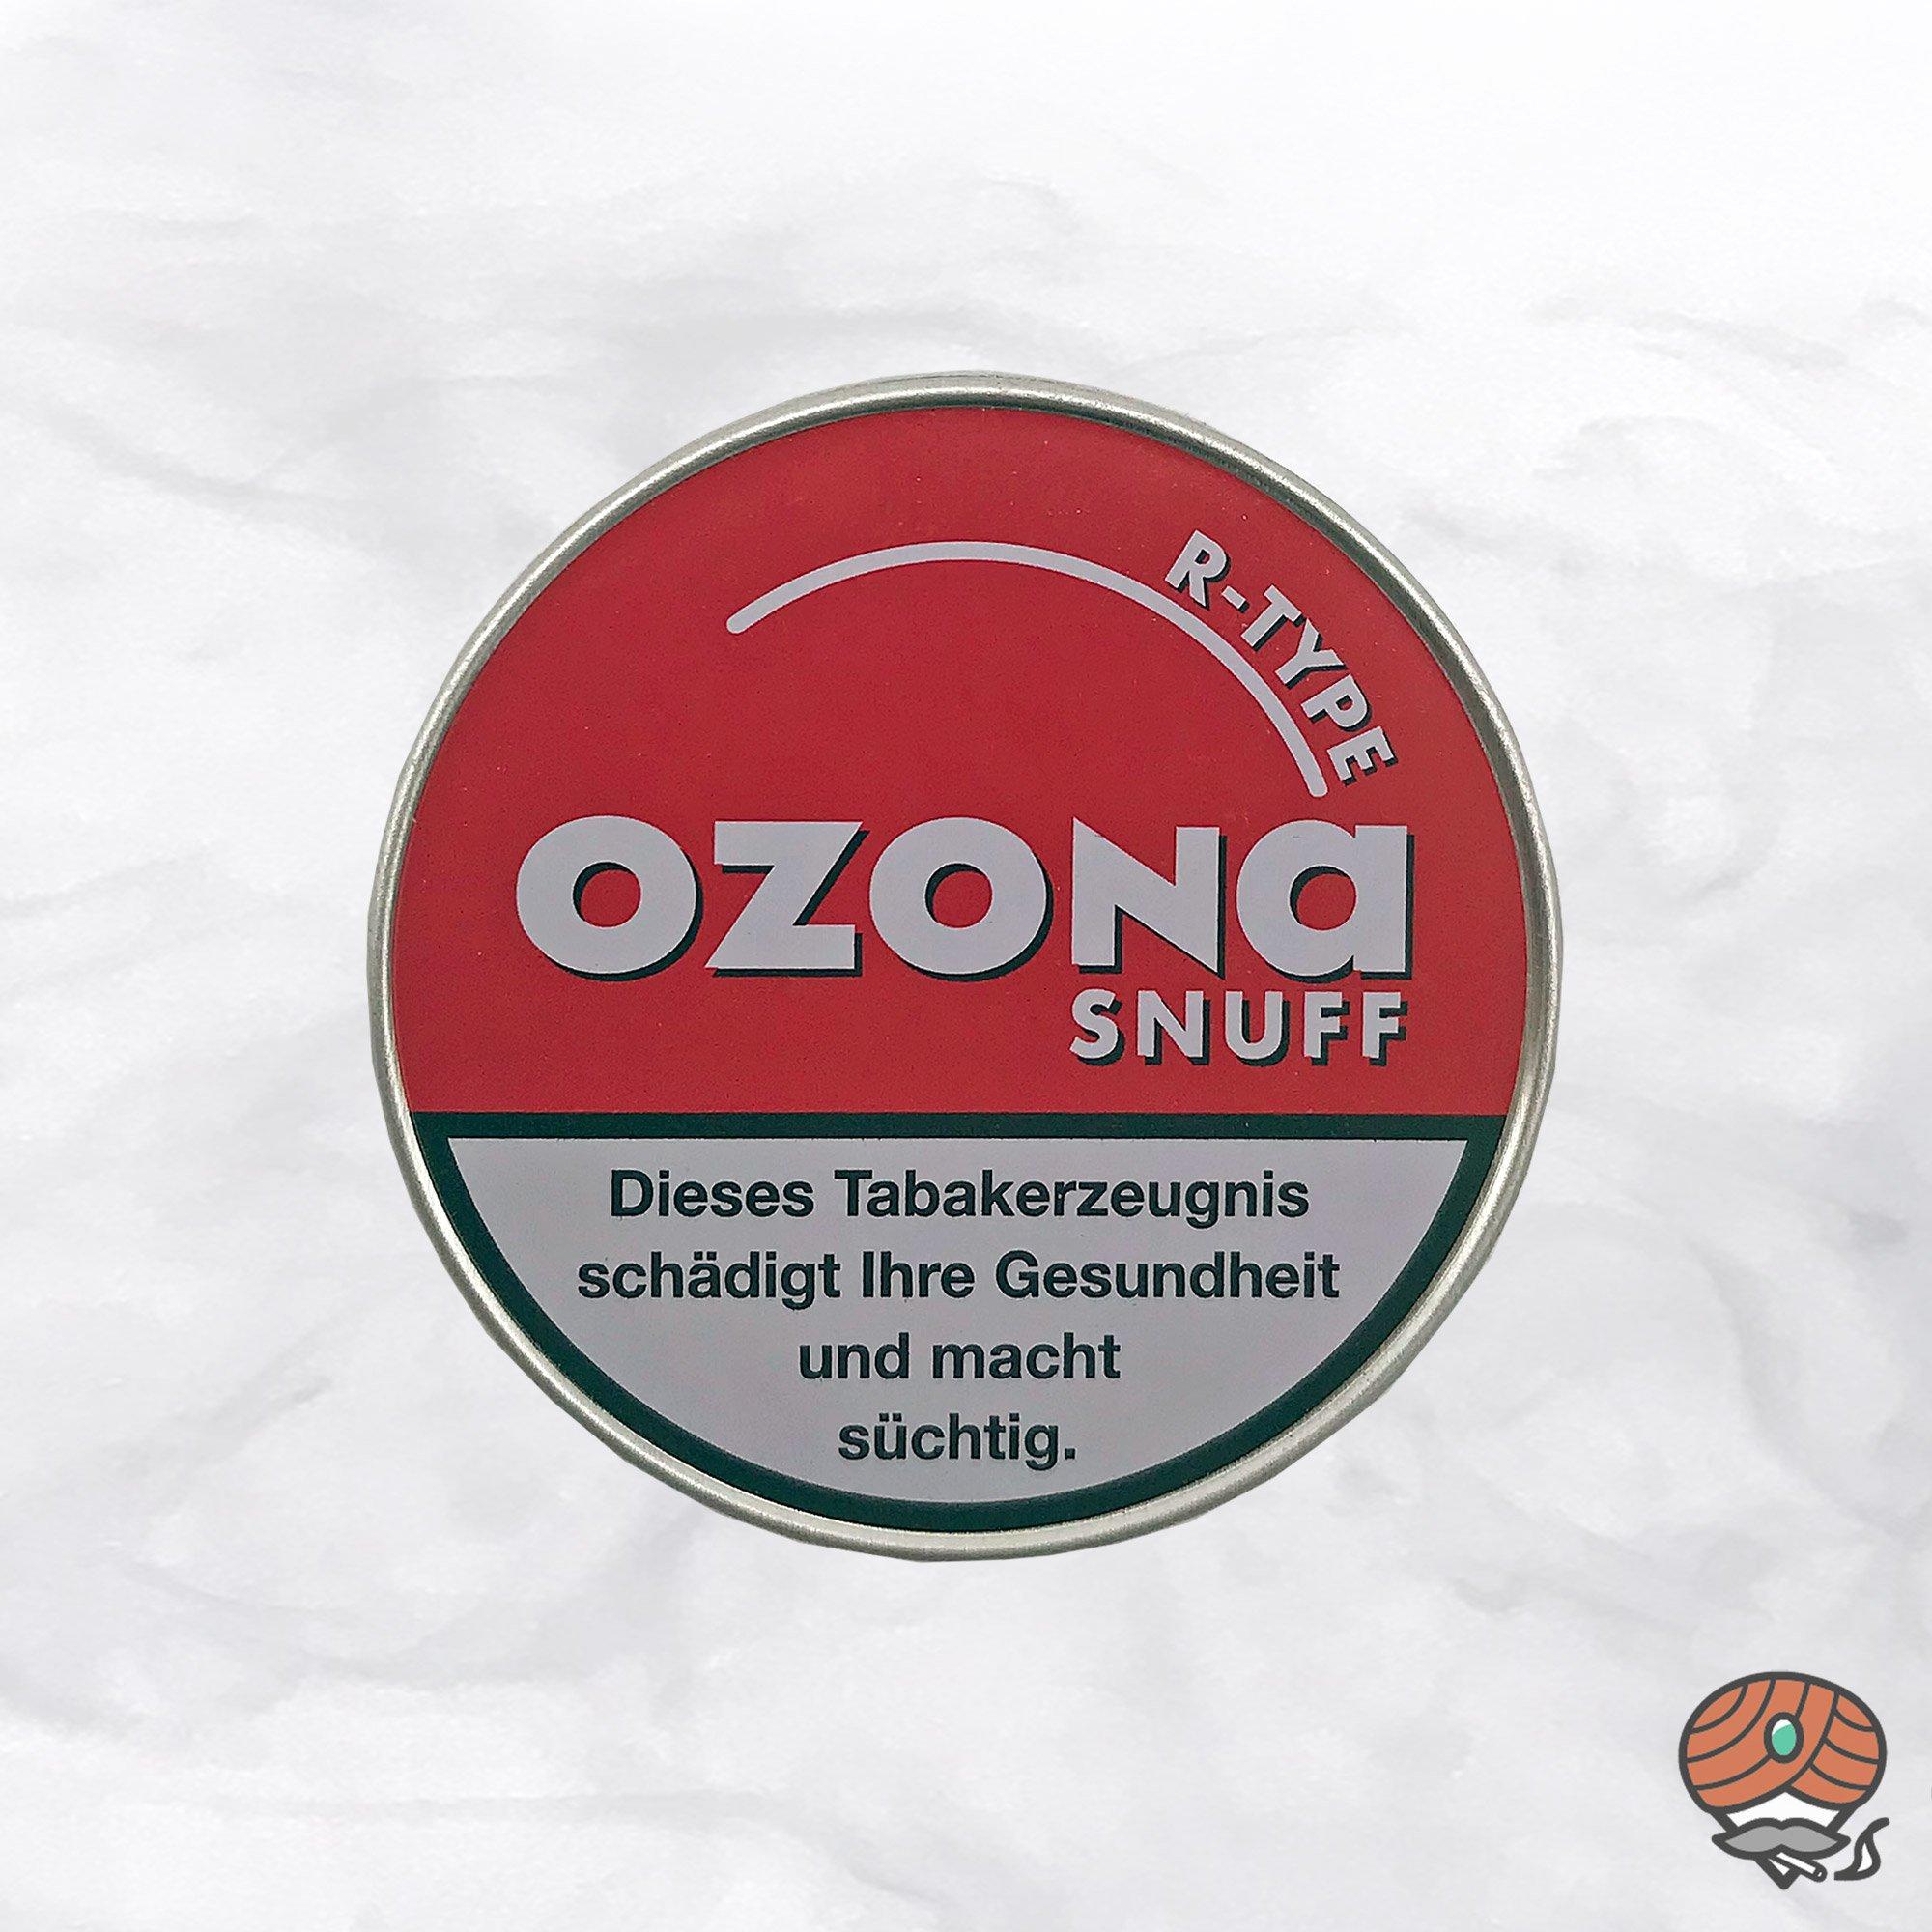 Ozona R-TYPE Snuff Schnupftabak 5g - Himbeere